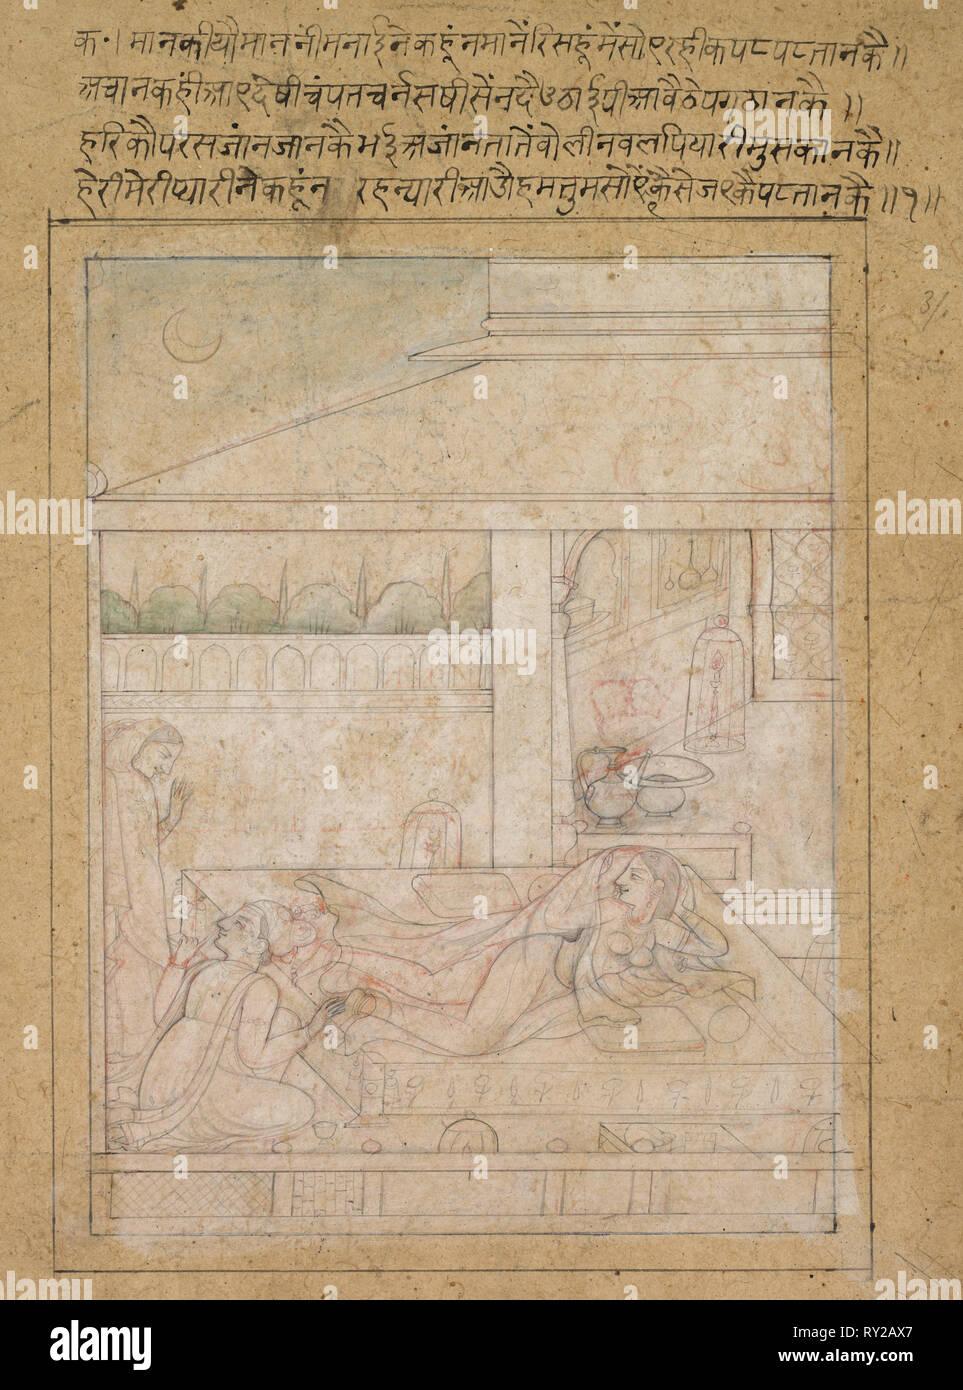 Radha and Krishna's Reconciliation - Stock Image